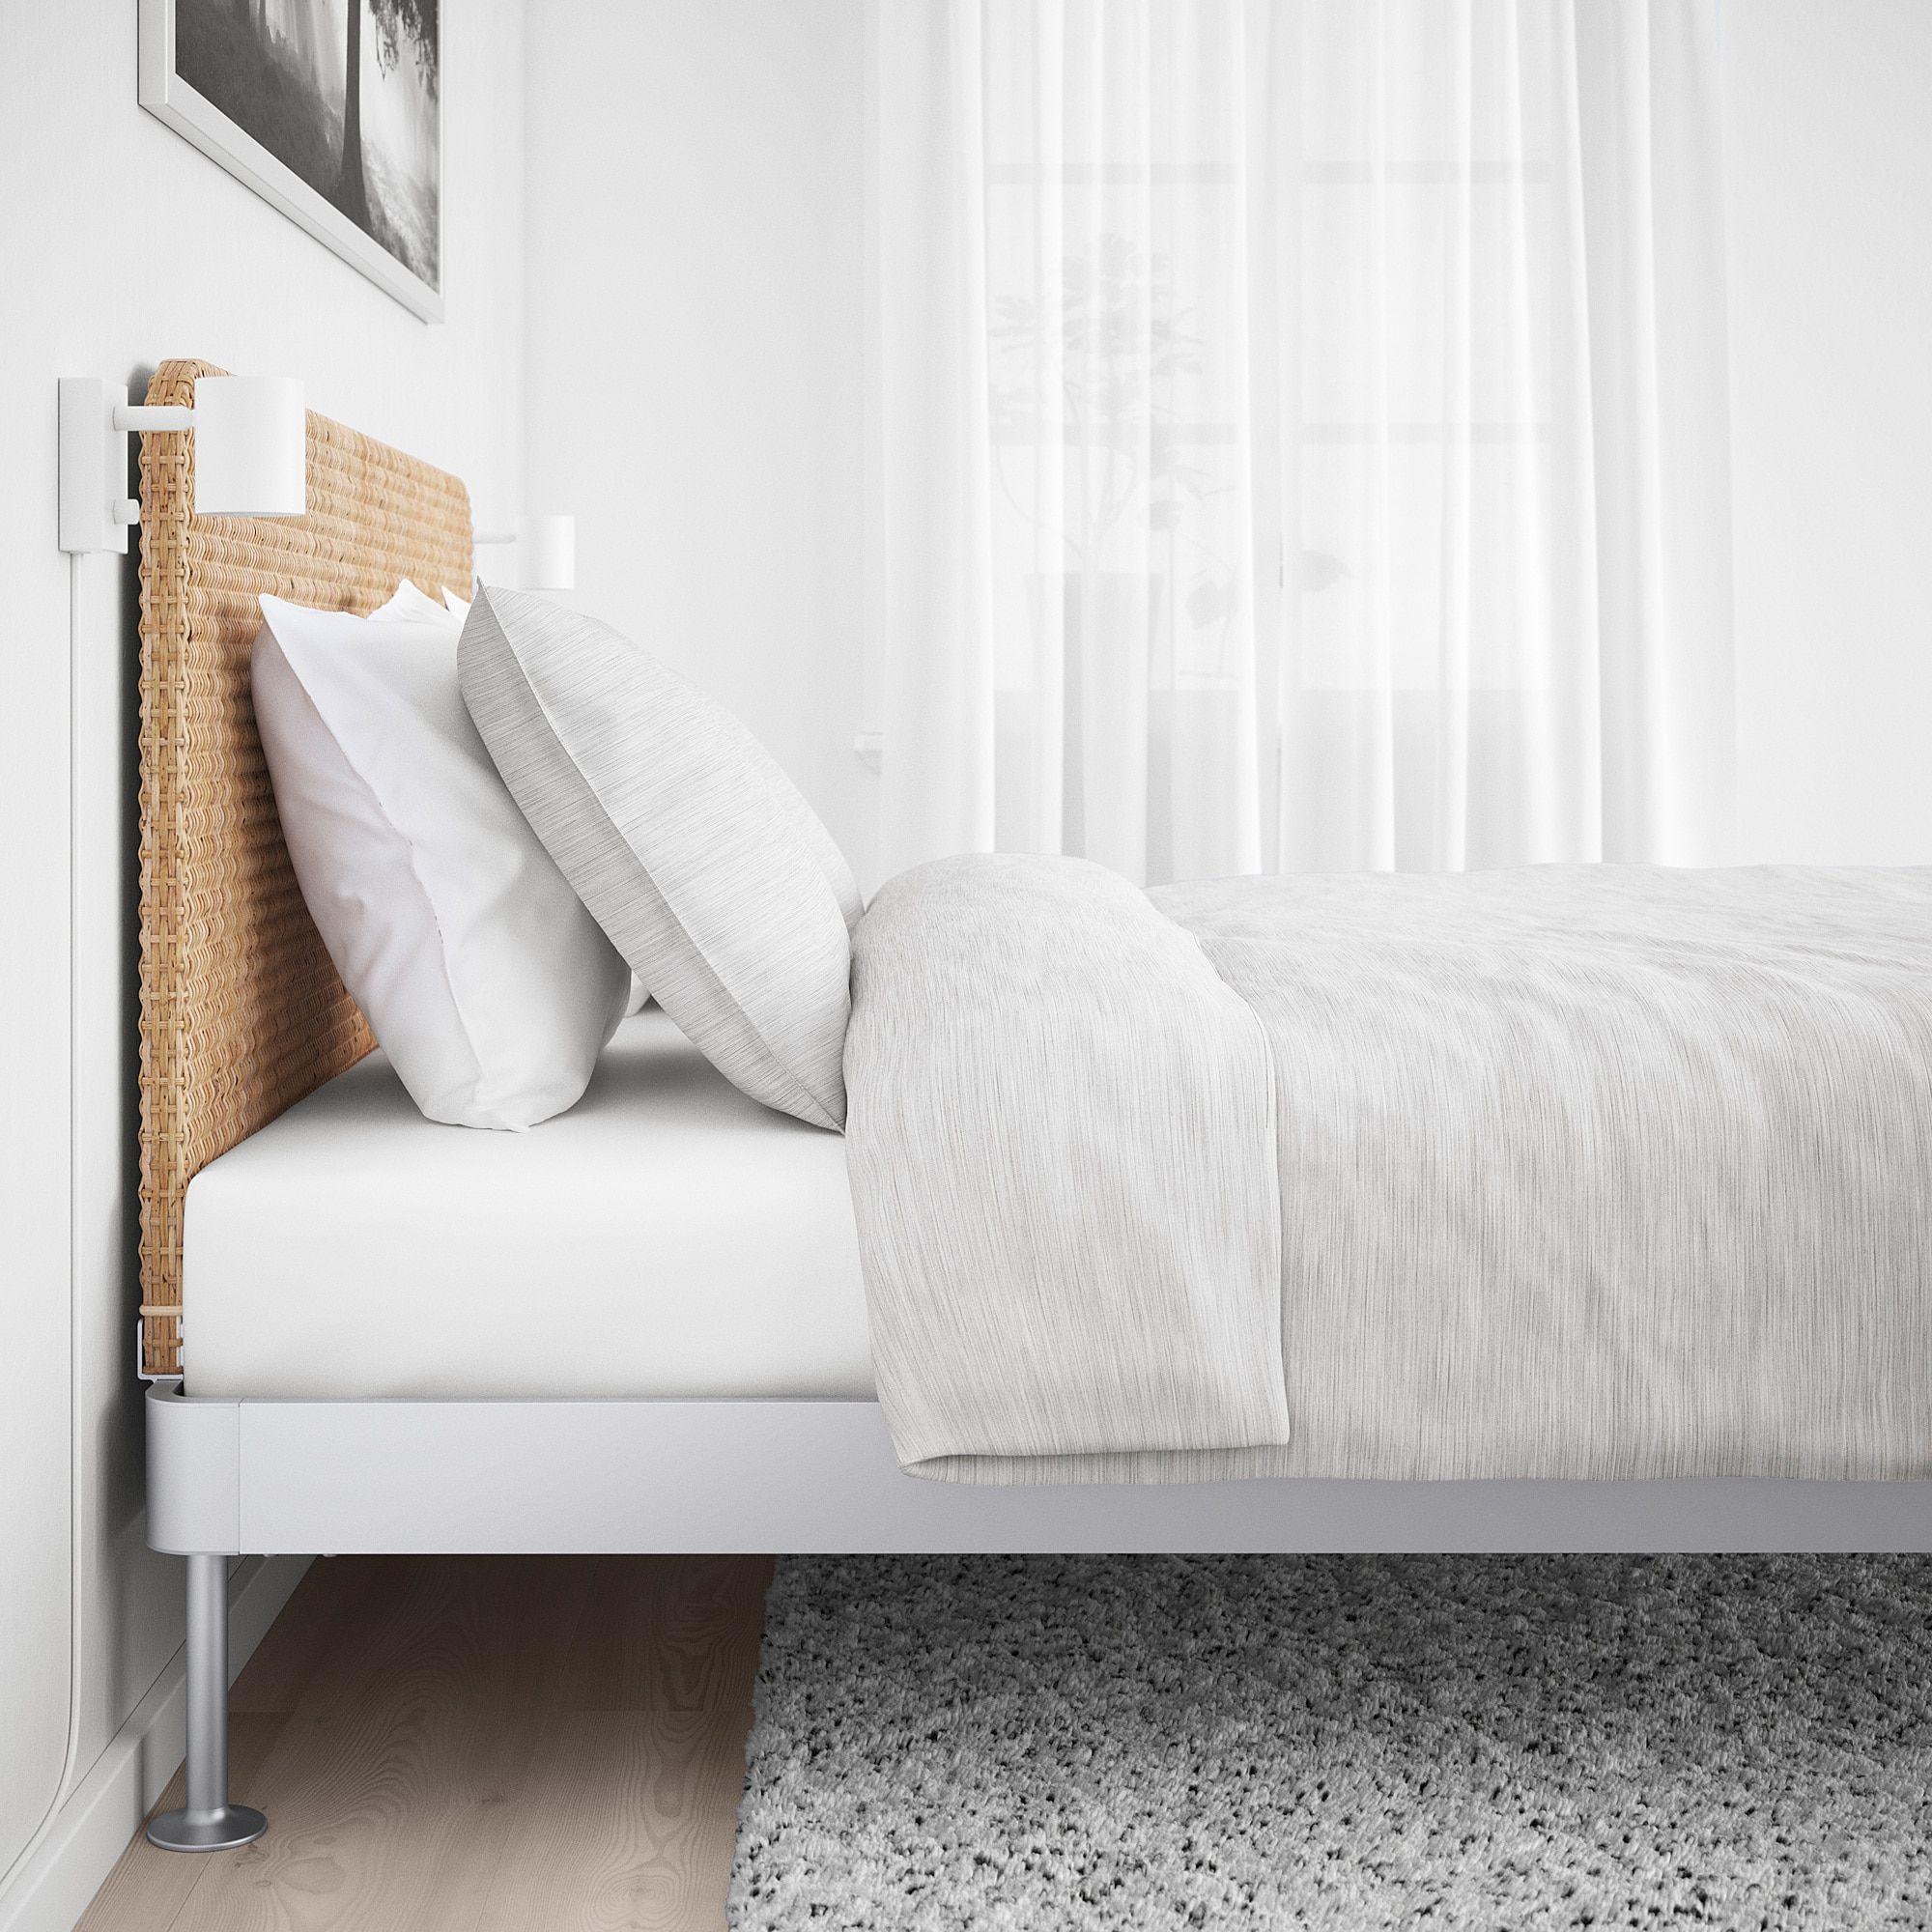 Ikea Delaktig Bed Frame With Headboard Aluminum Rattan